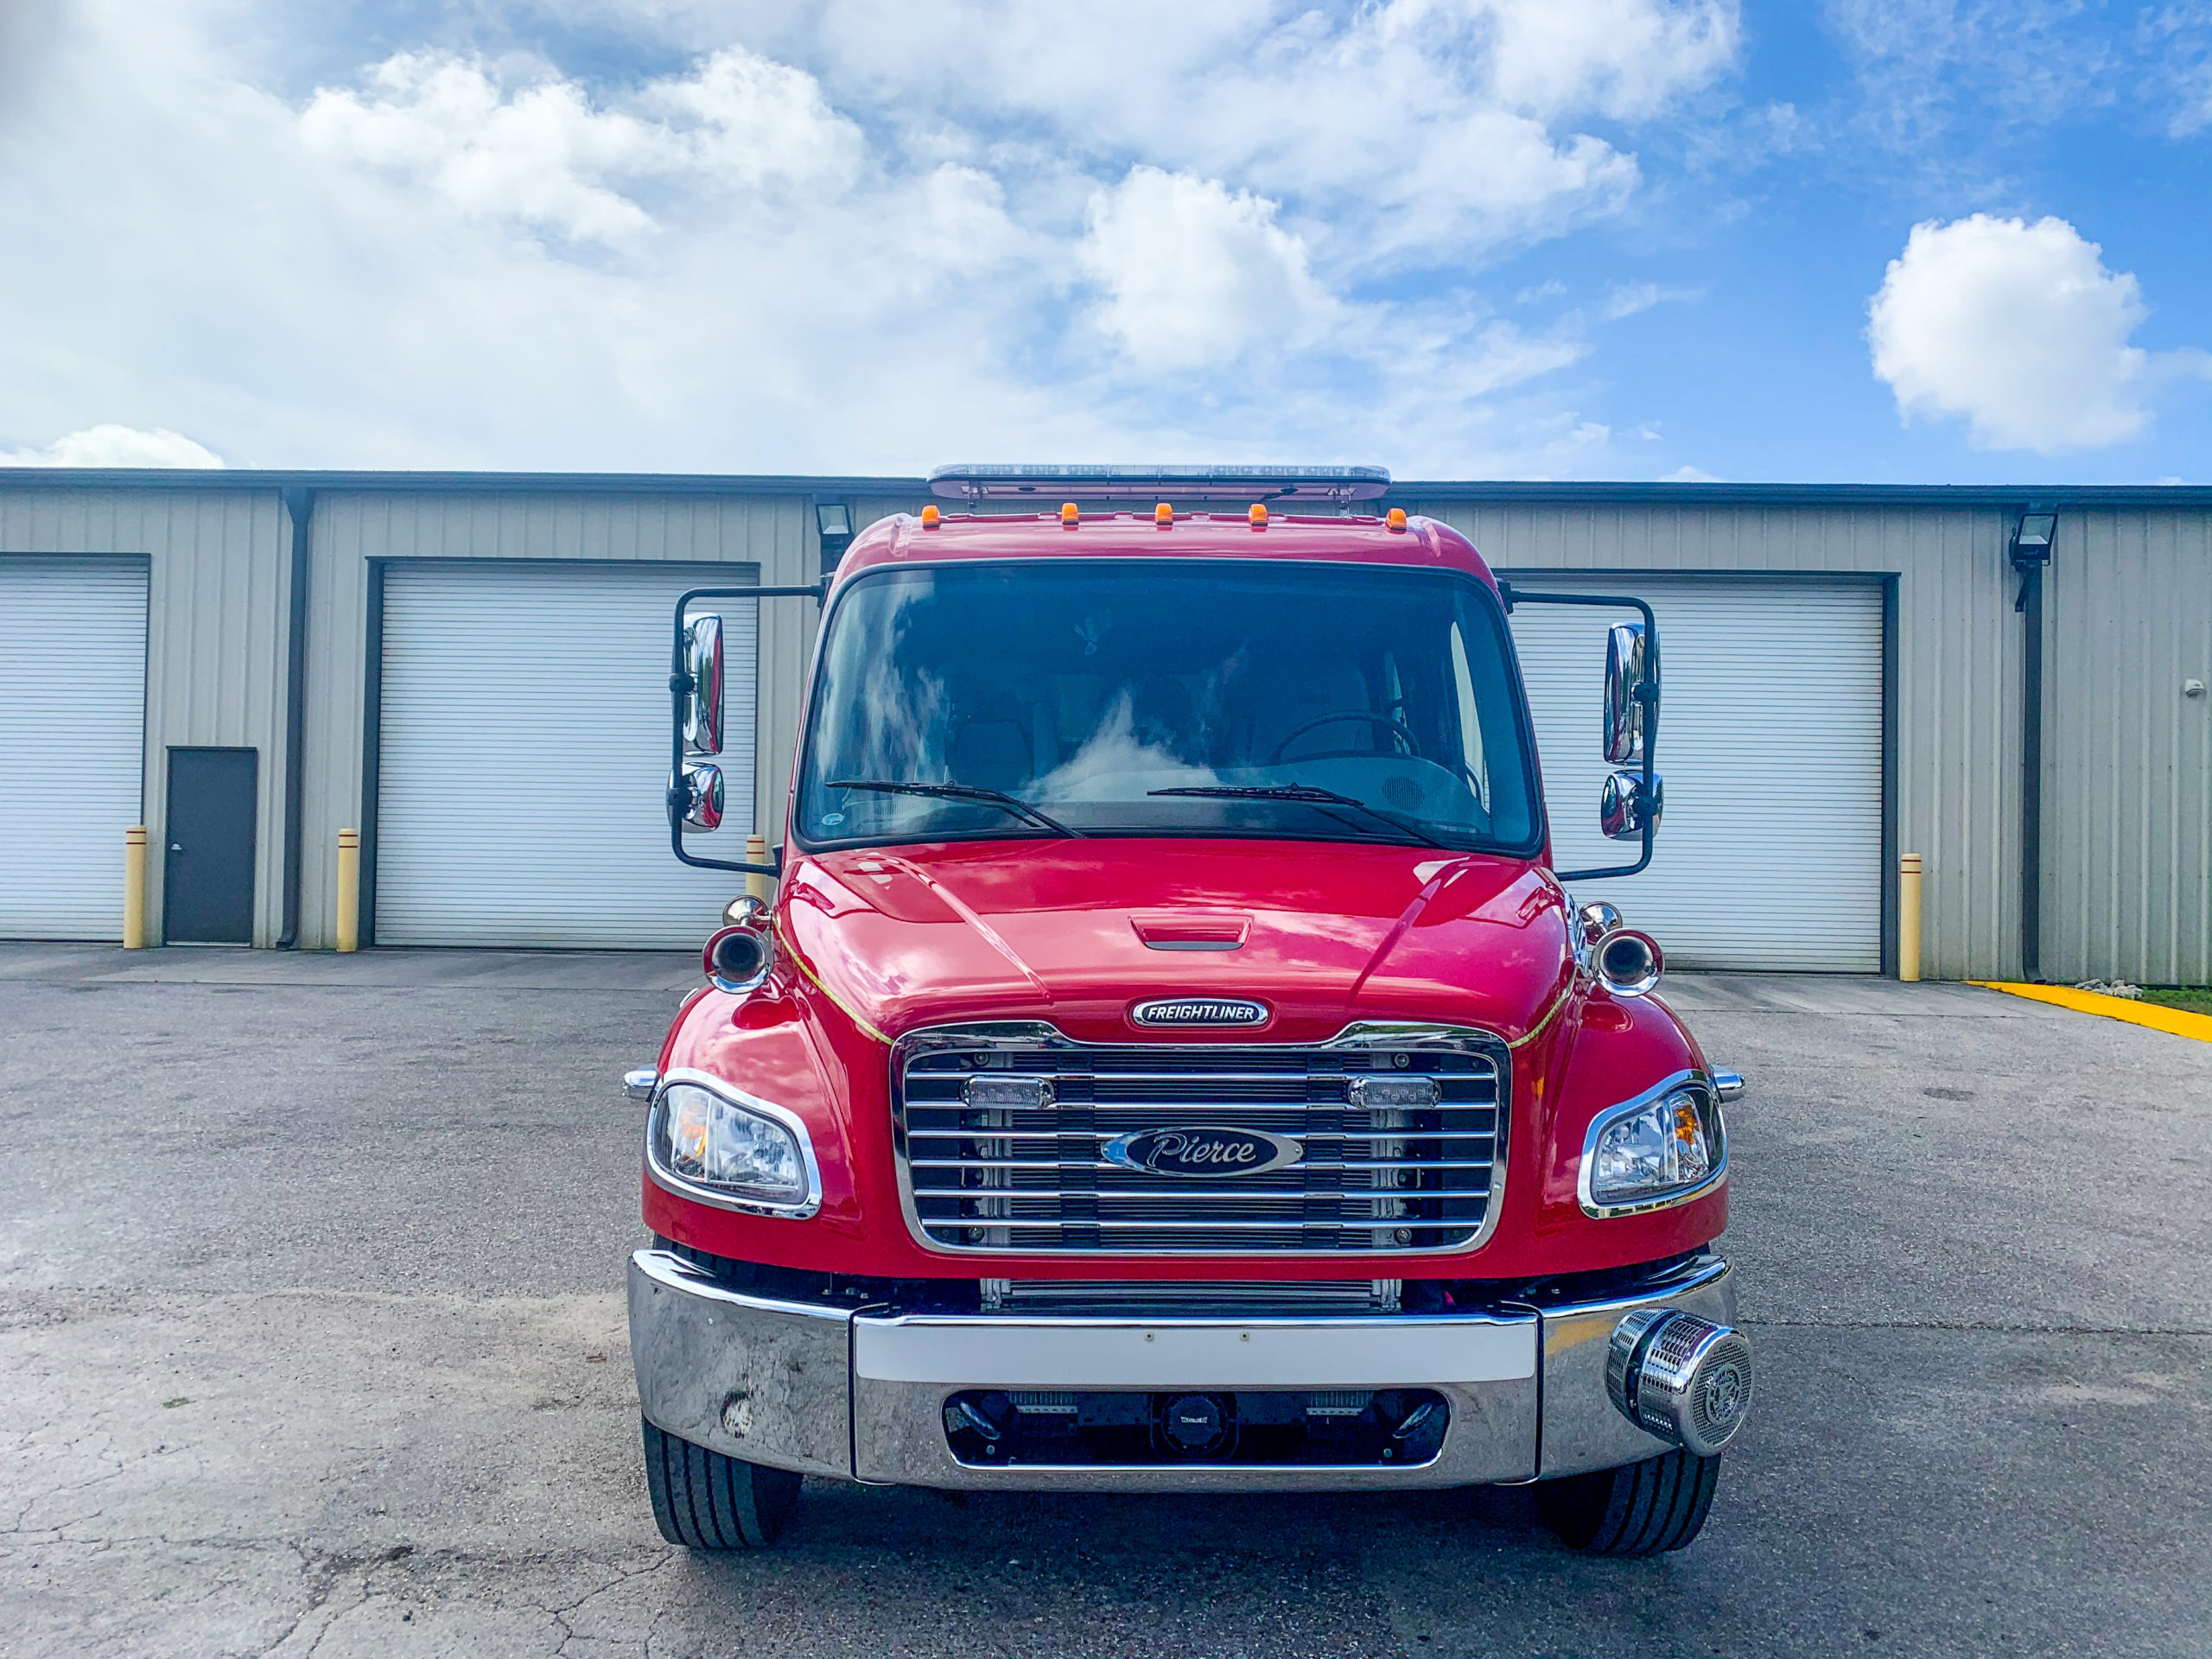 EM_galveston-volunteer-fire-department-pumper-35420